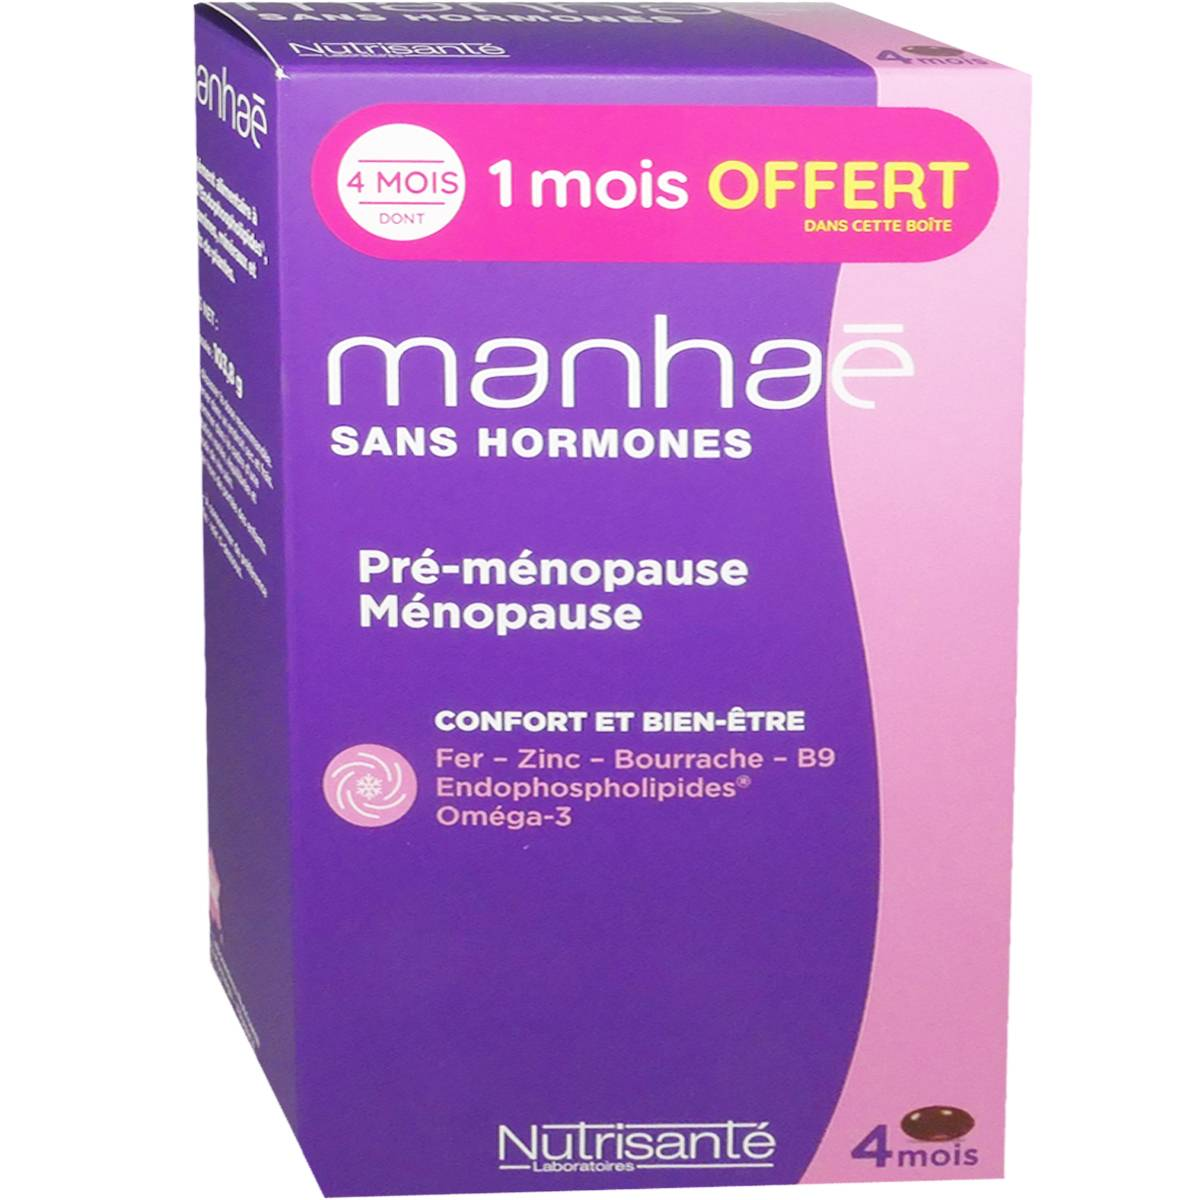 Nutrisante manhae 120 capsules cure de 4 mois